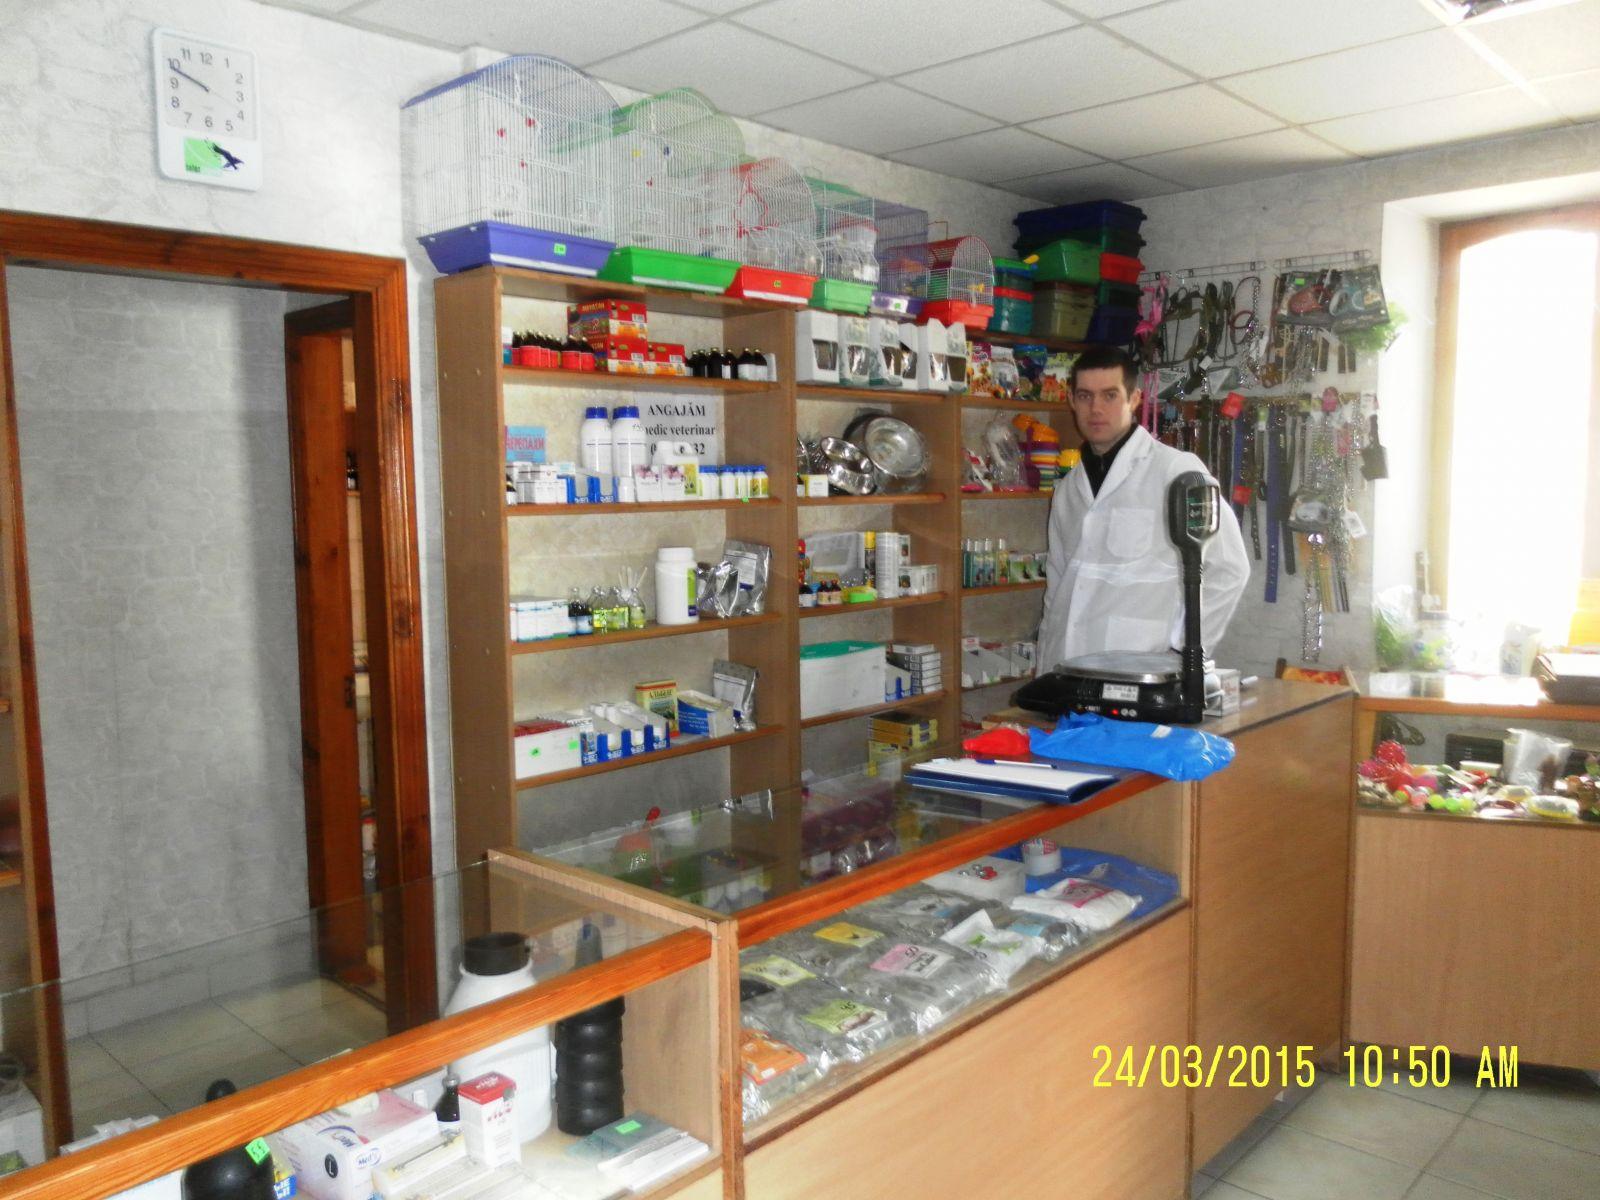 medicamente comune într-o farmacie veterinară